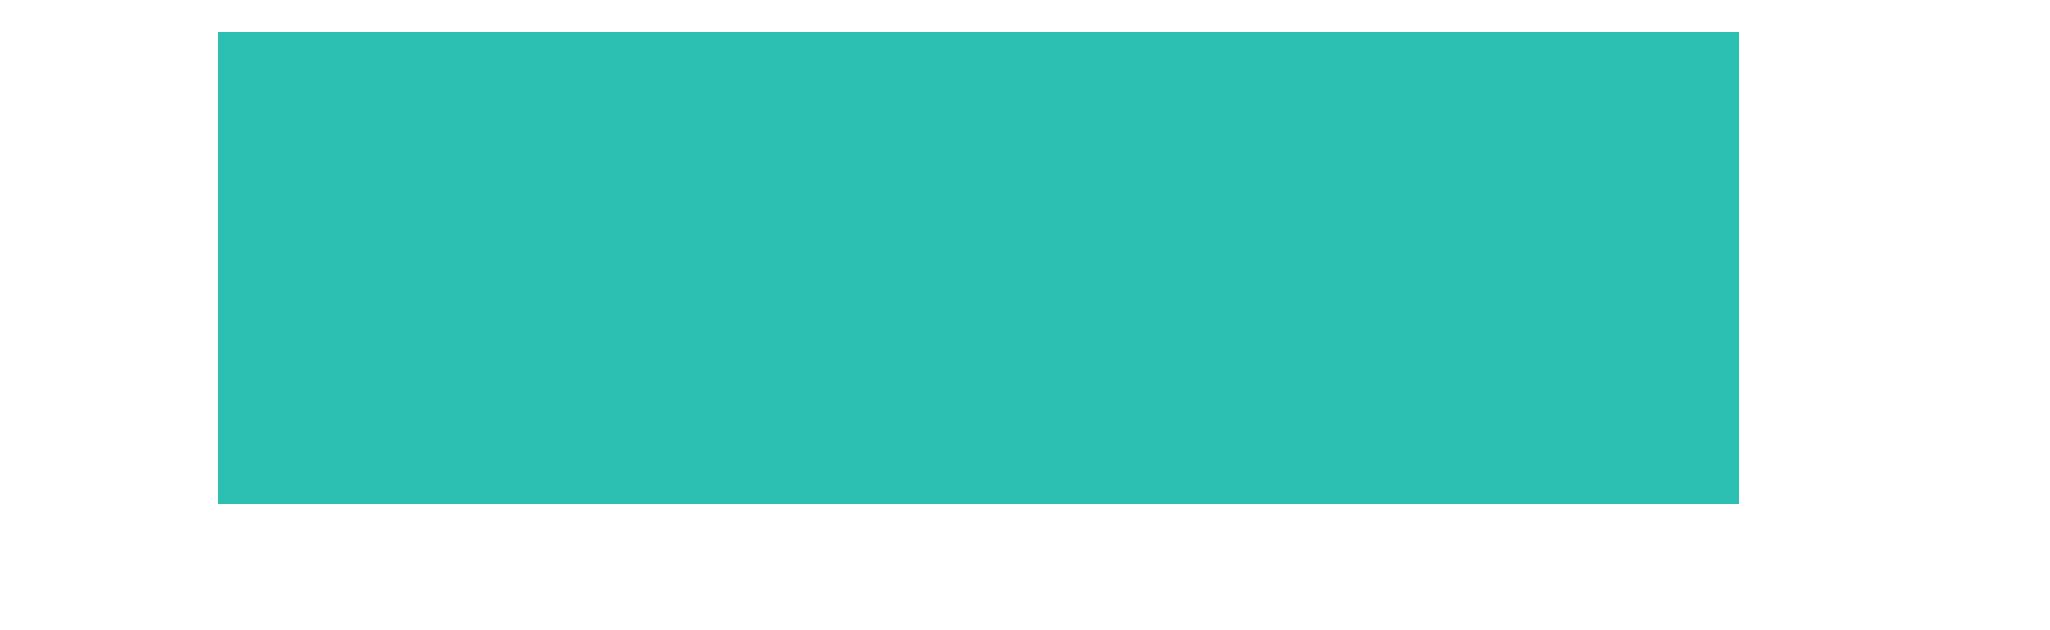 Review Sidekick